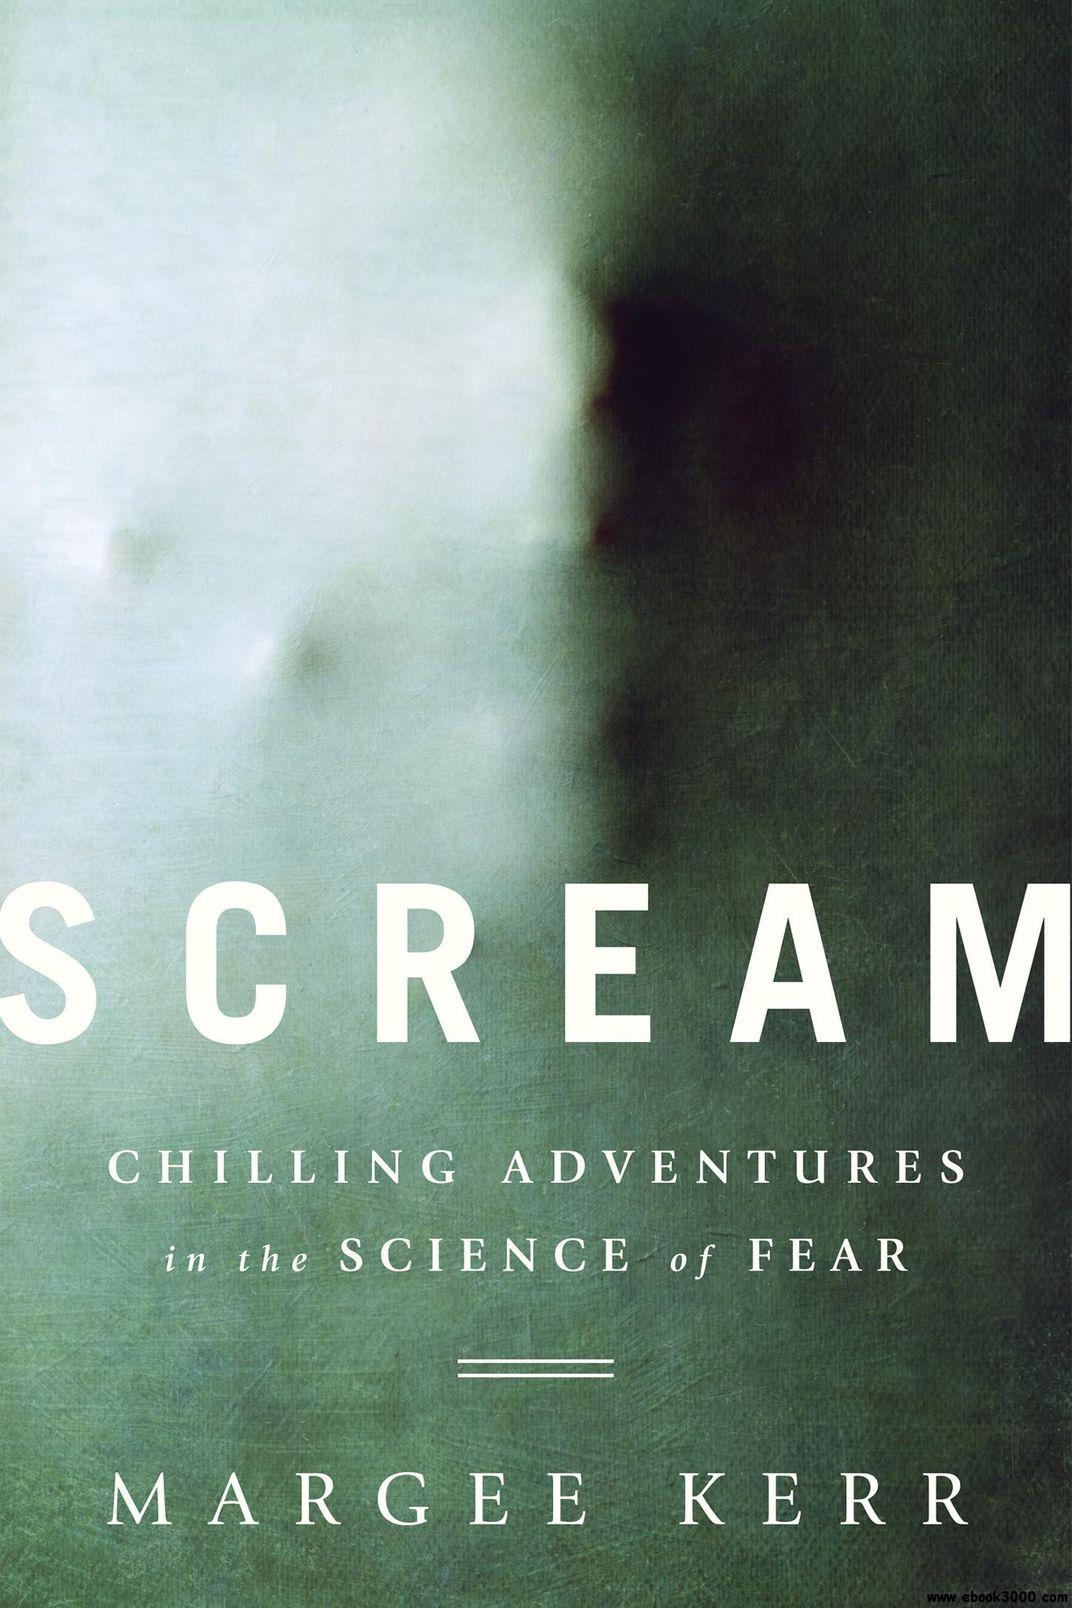 <em>Scream</em> by Margee Kerr